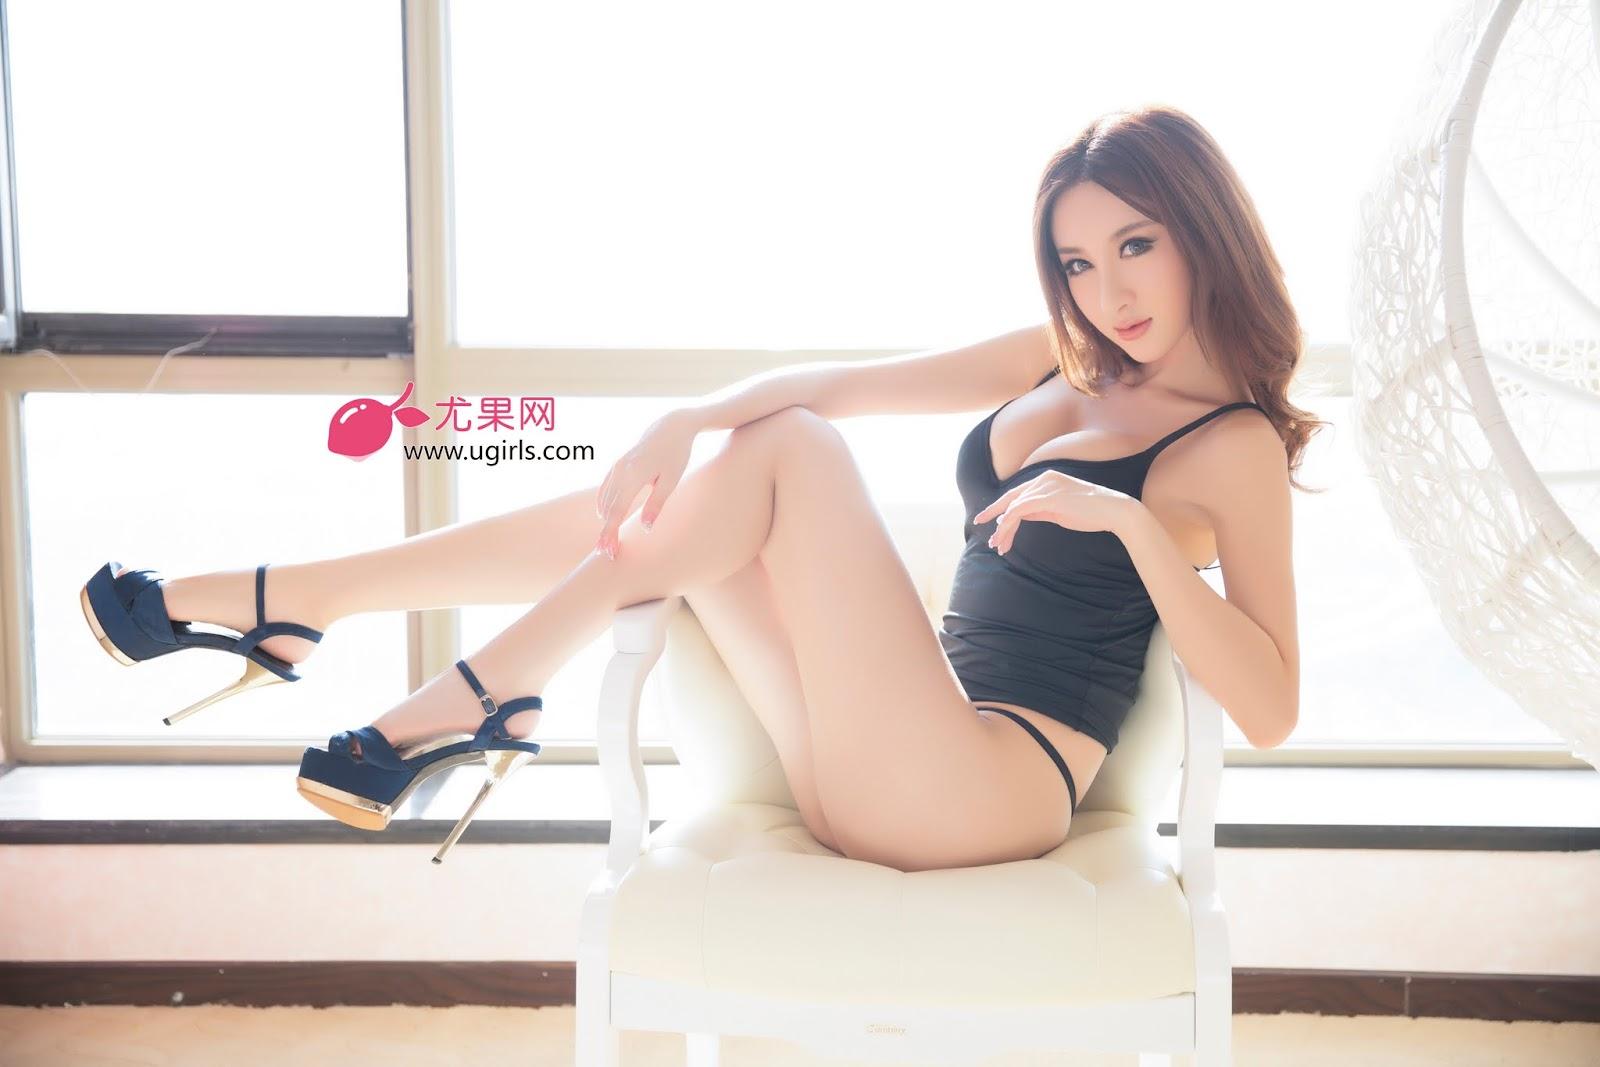 A14A6698 - Hot Photo UGIRLS NO.6 Nude Girl